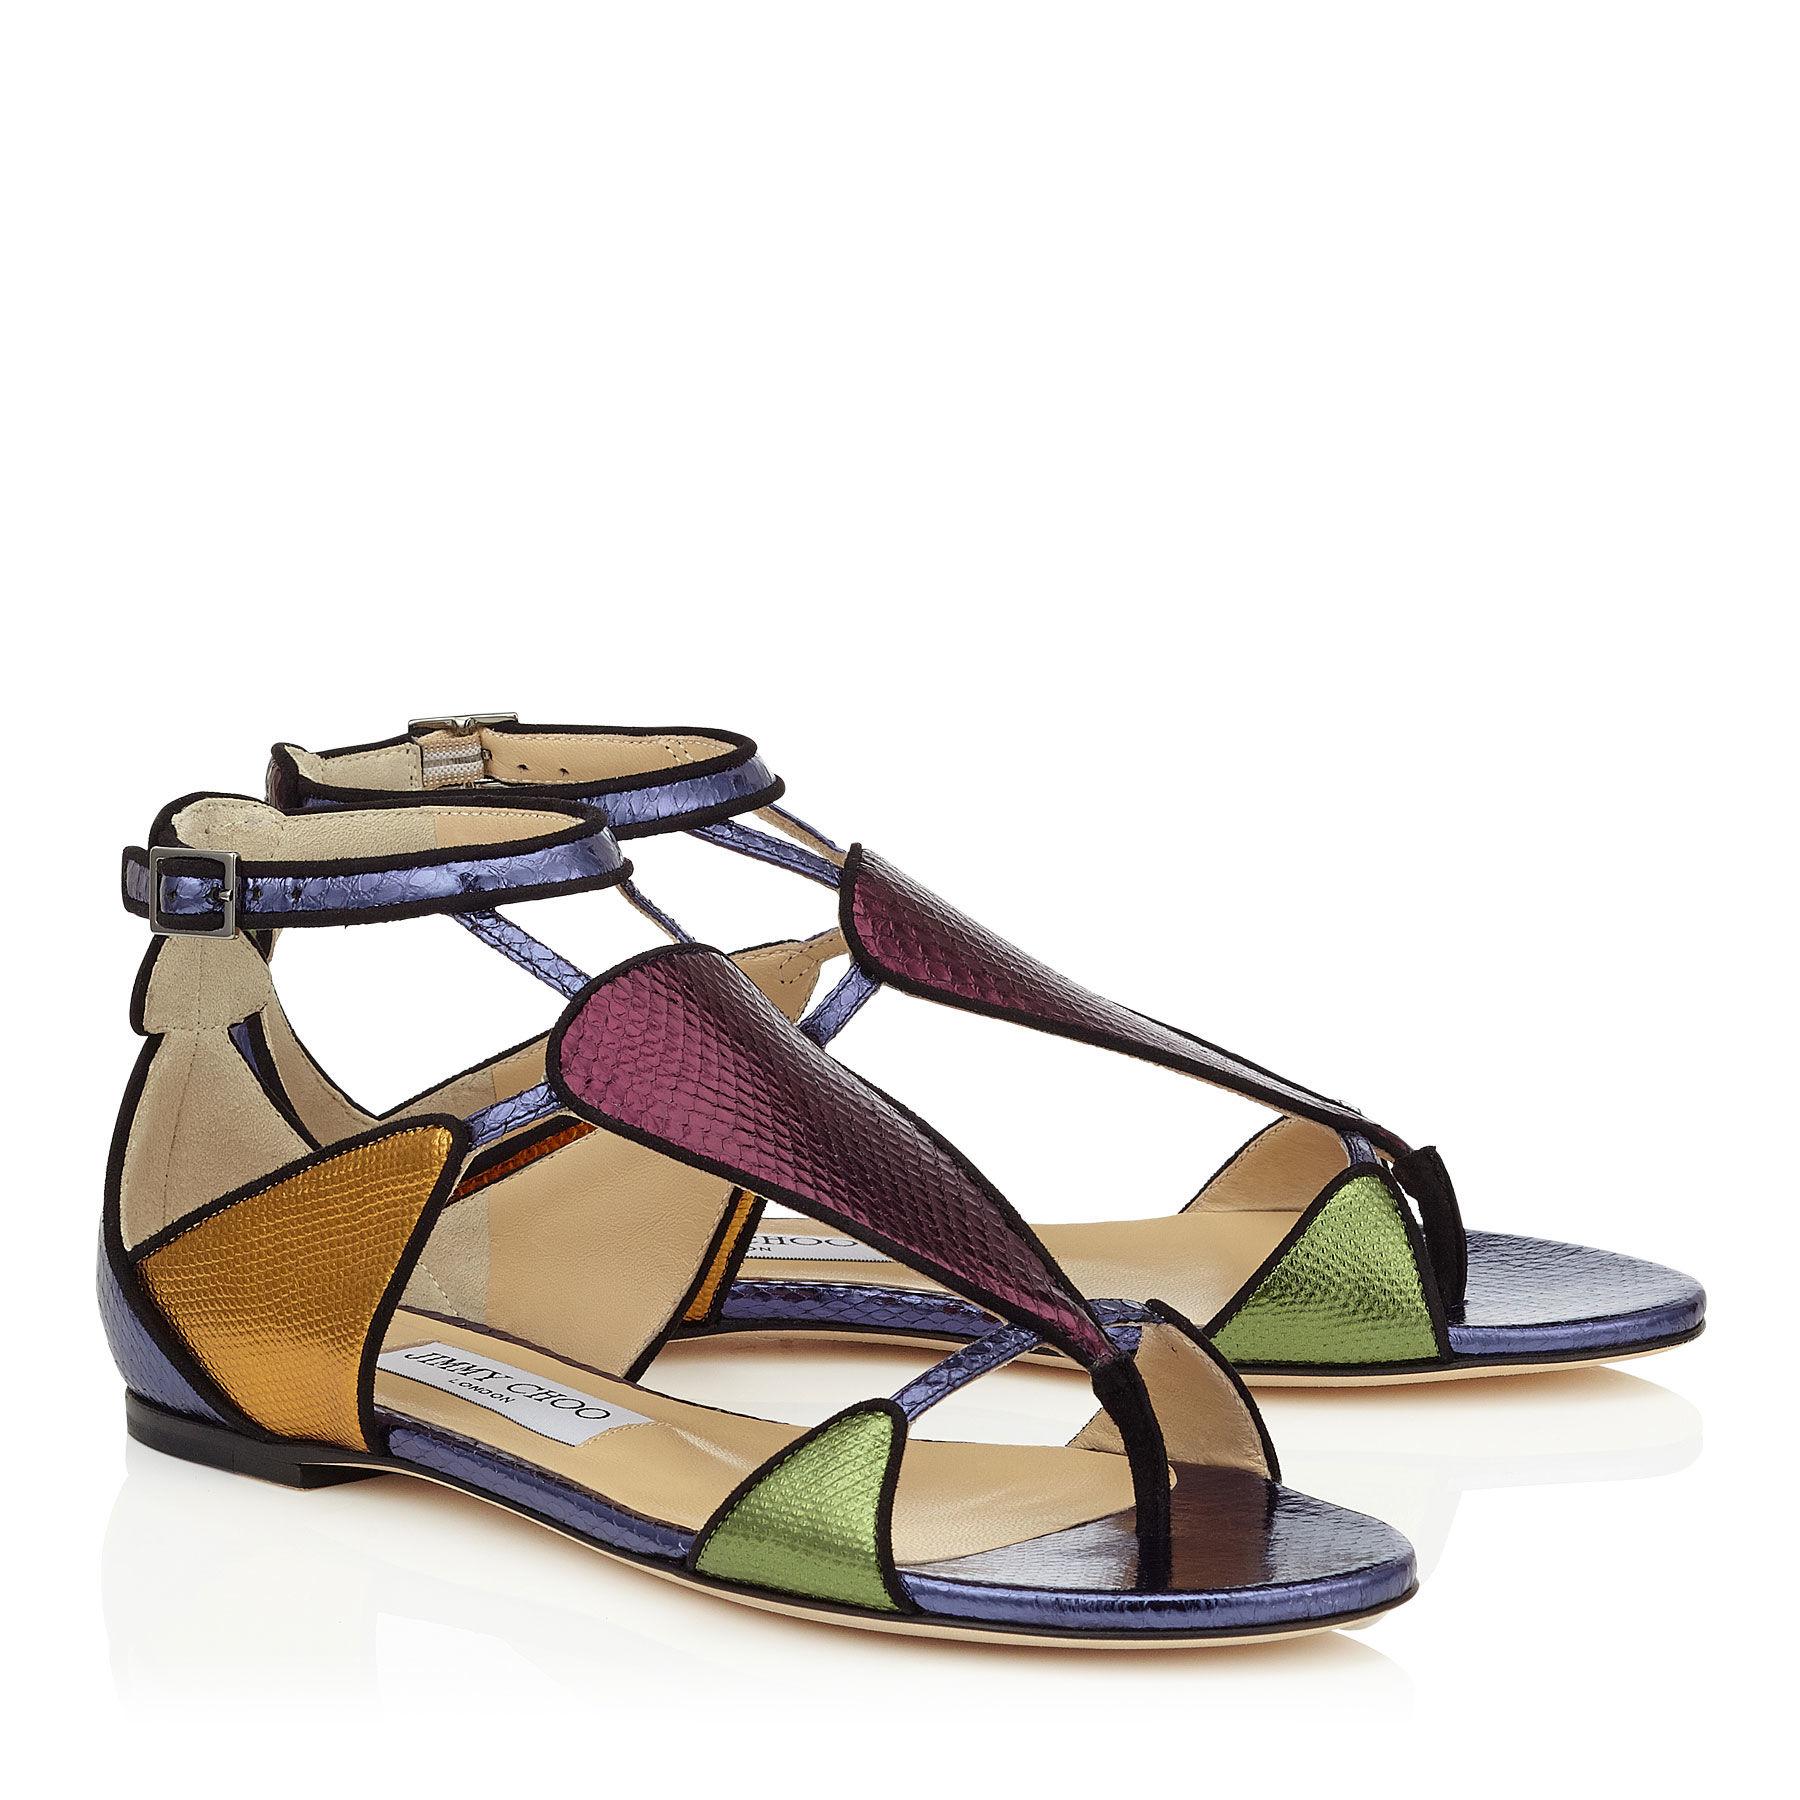 Sandali bassi: i modelli dell'estate 2016